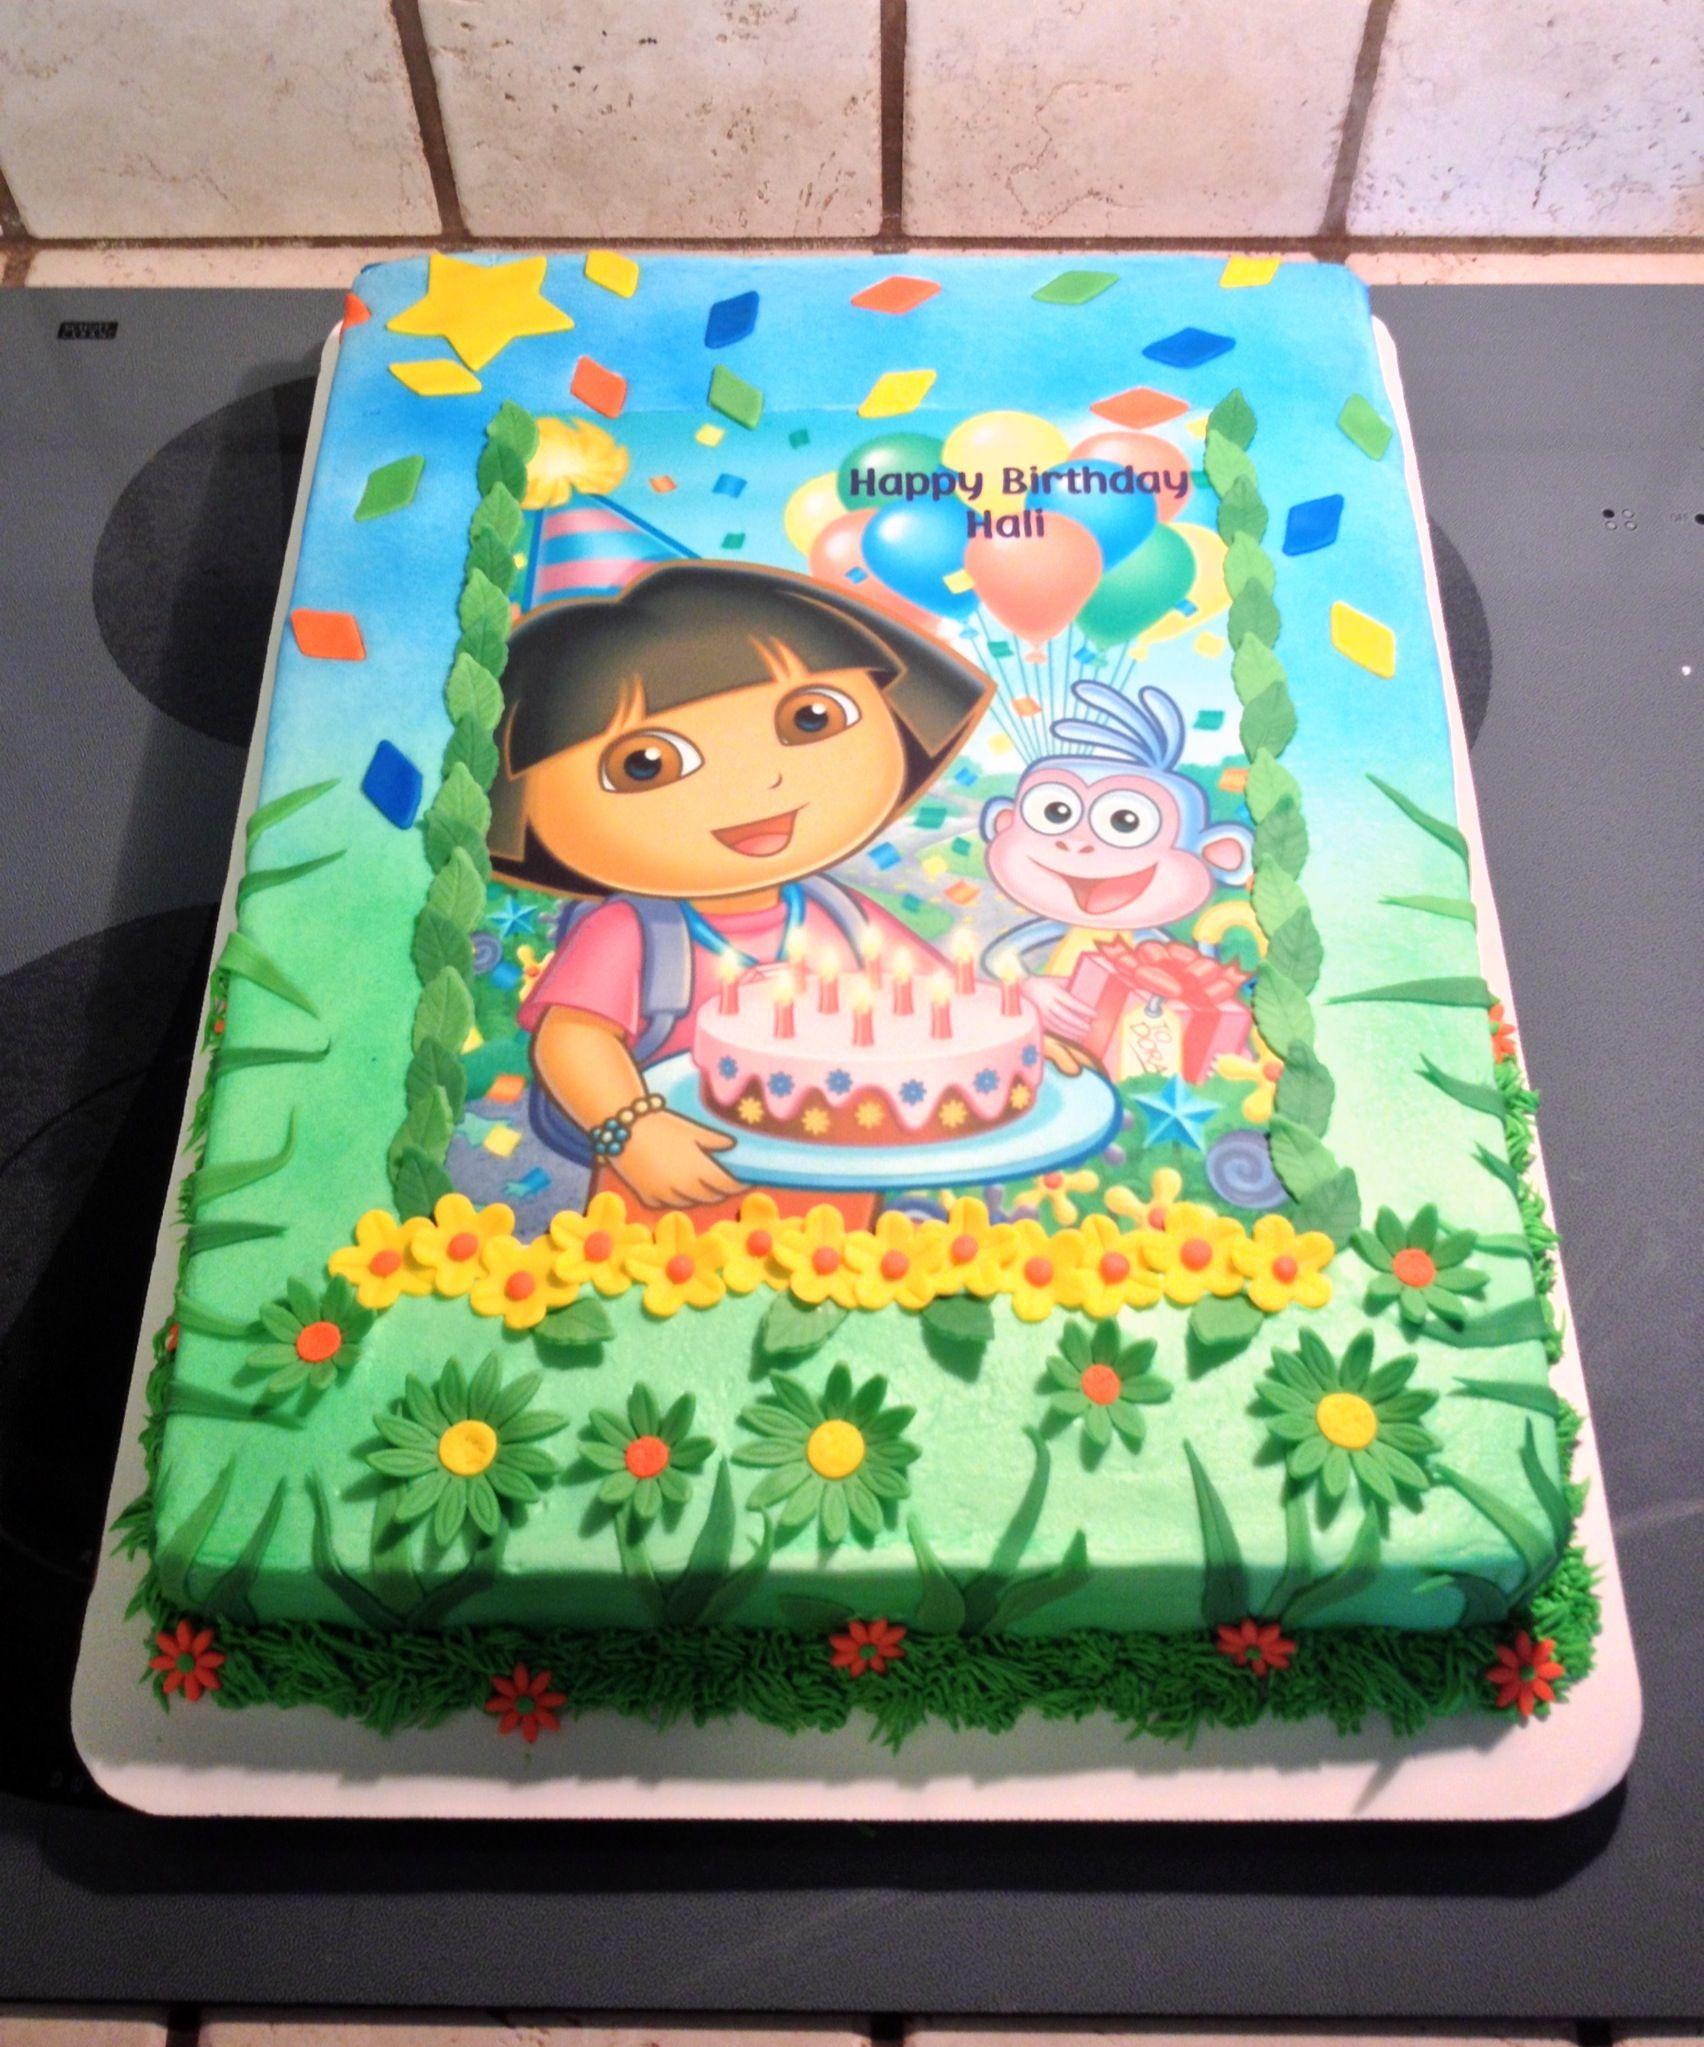 Pleasant 100 Dora 2Nd Birthday Cake Ideas Bluebay Desserts Vancouver Funny Birthday Cards Online Alyptdamsfinfo